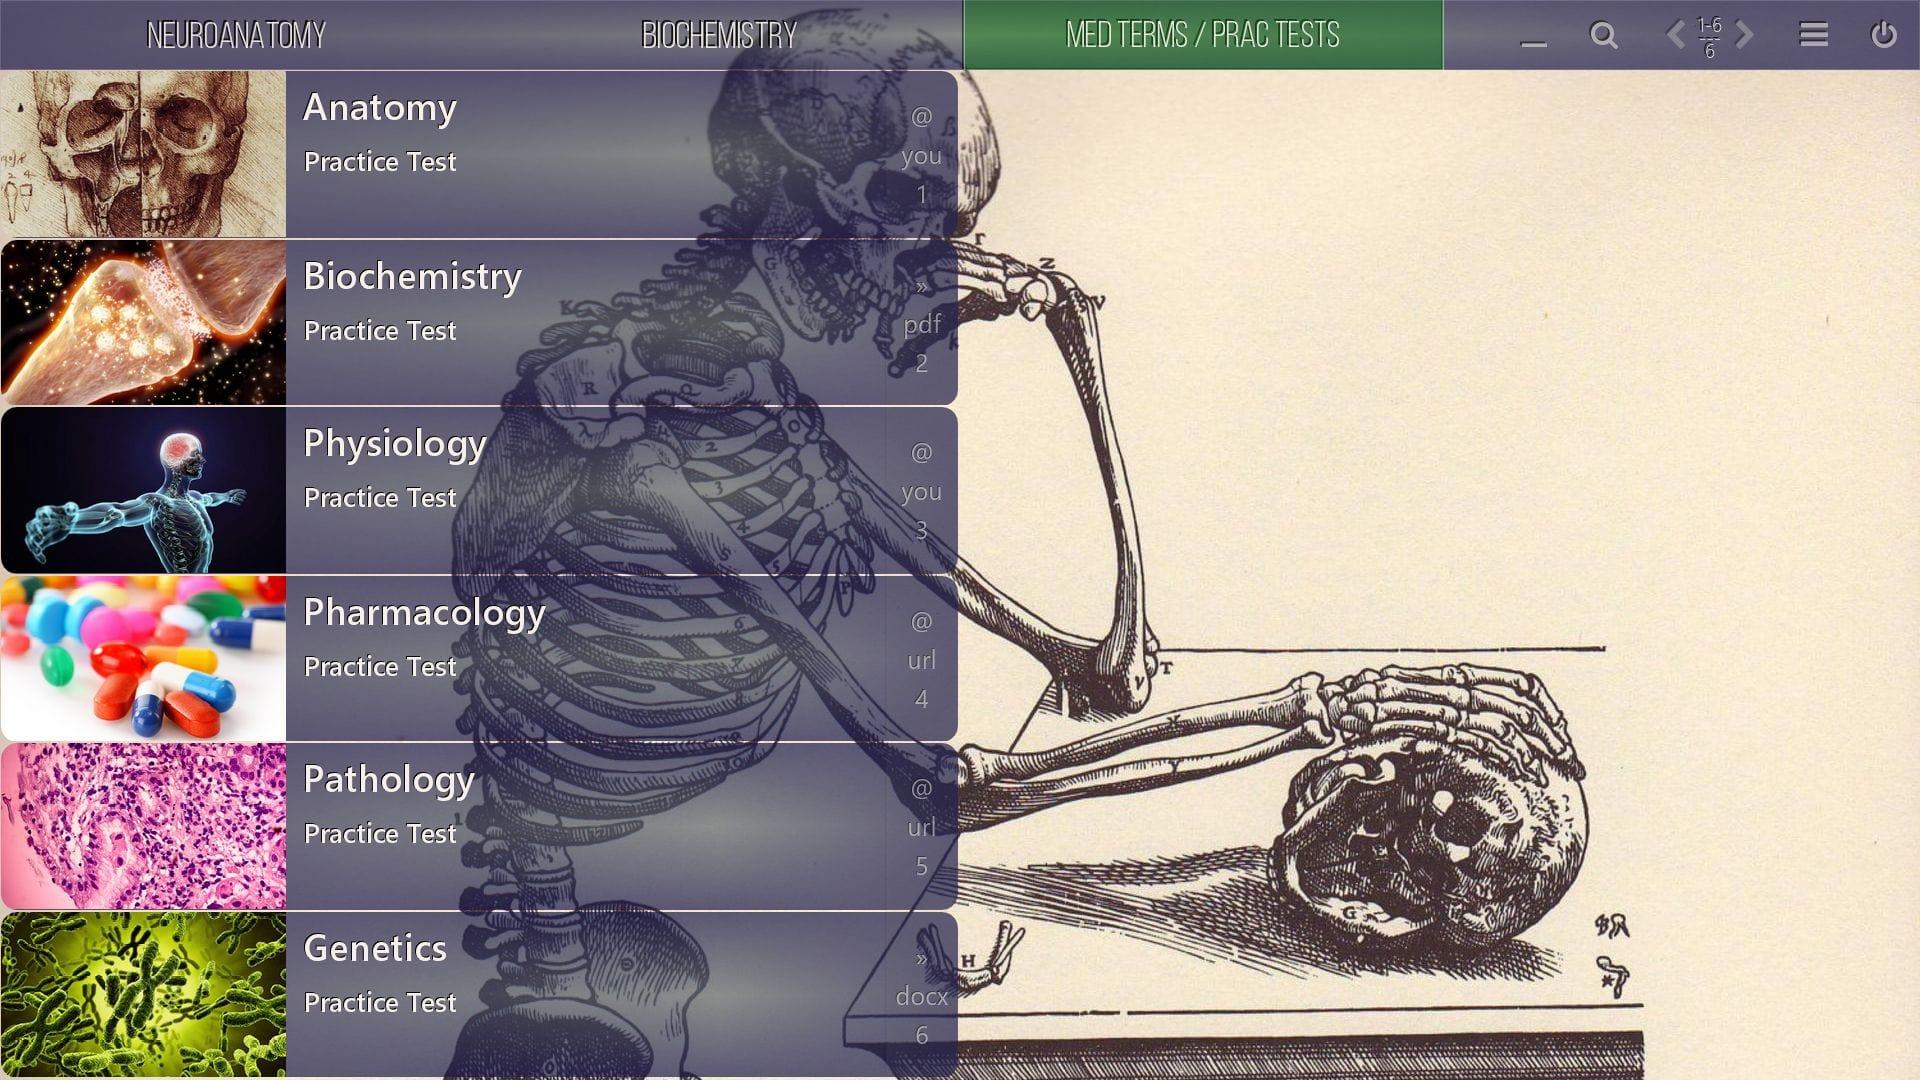 mediaboard video poster medical terms 3 ENGLISH HTLM5 - Mediaboard - Home EN